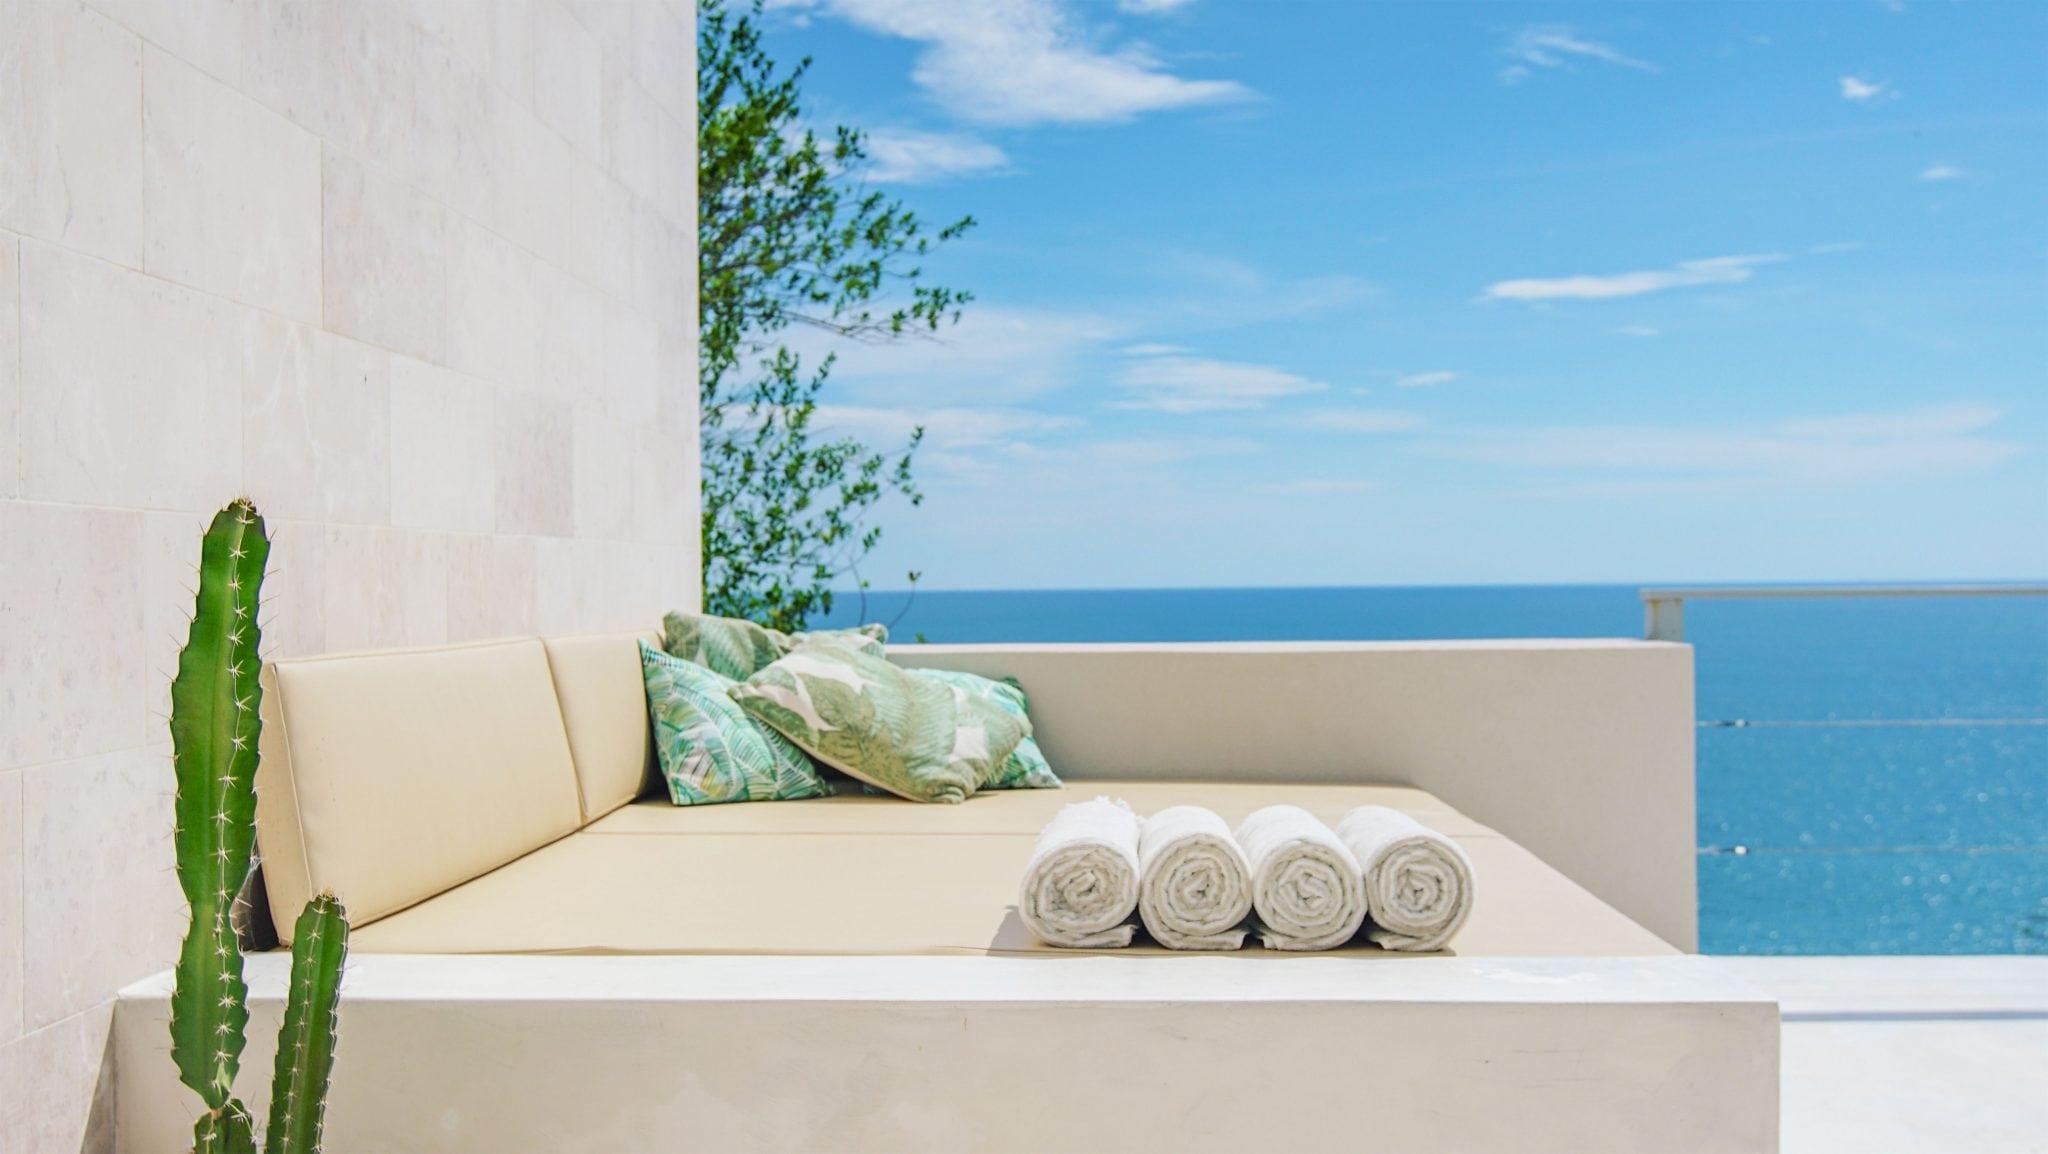 Villa Fugata Outdoor Lounge With Ocean View